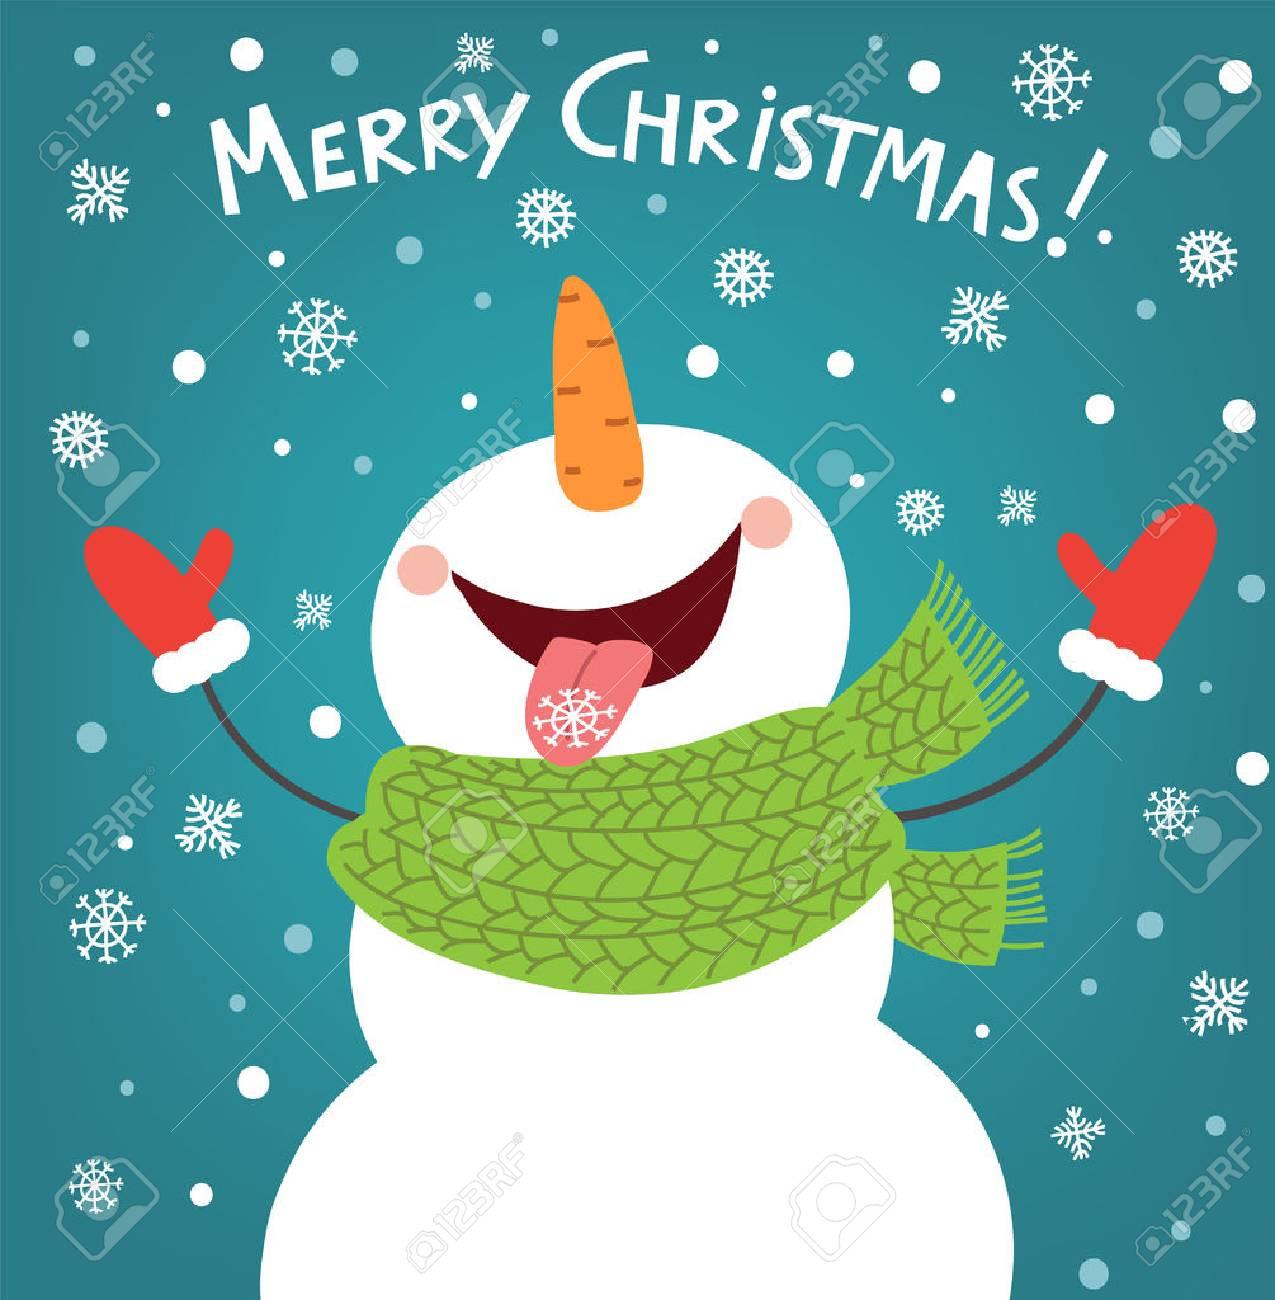 Funny snowman enjoying the snowflakes. Christmas card illustration - 66093384